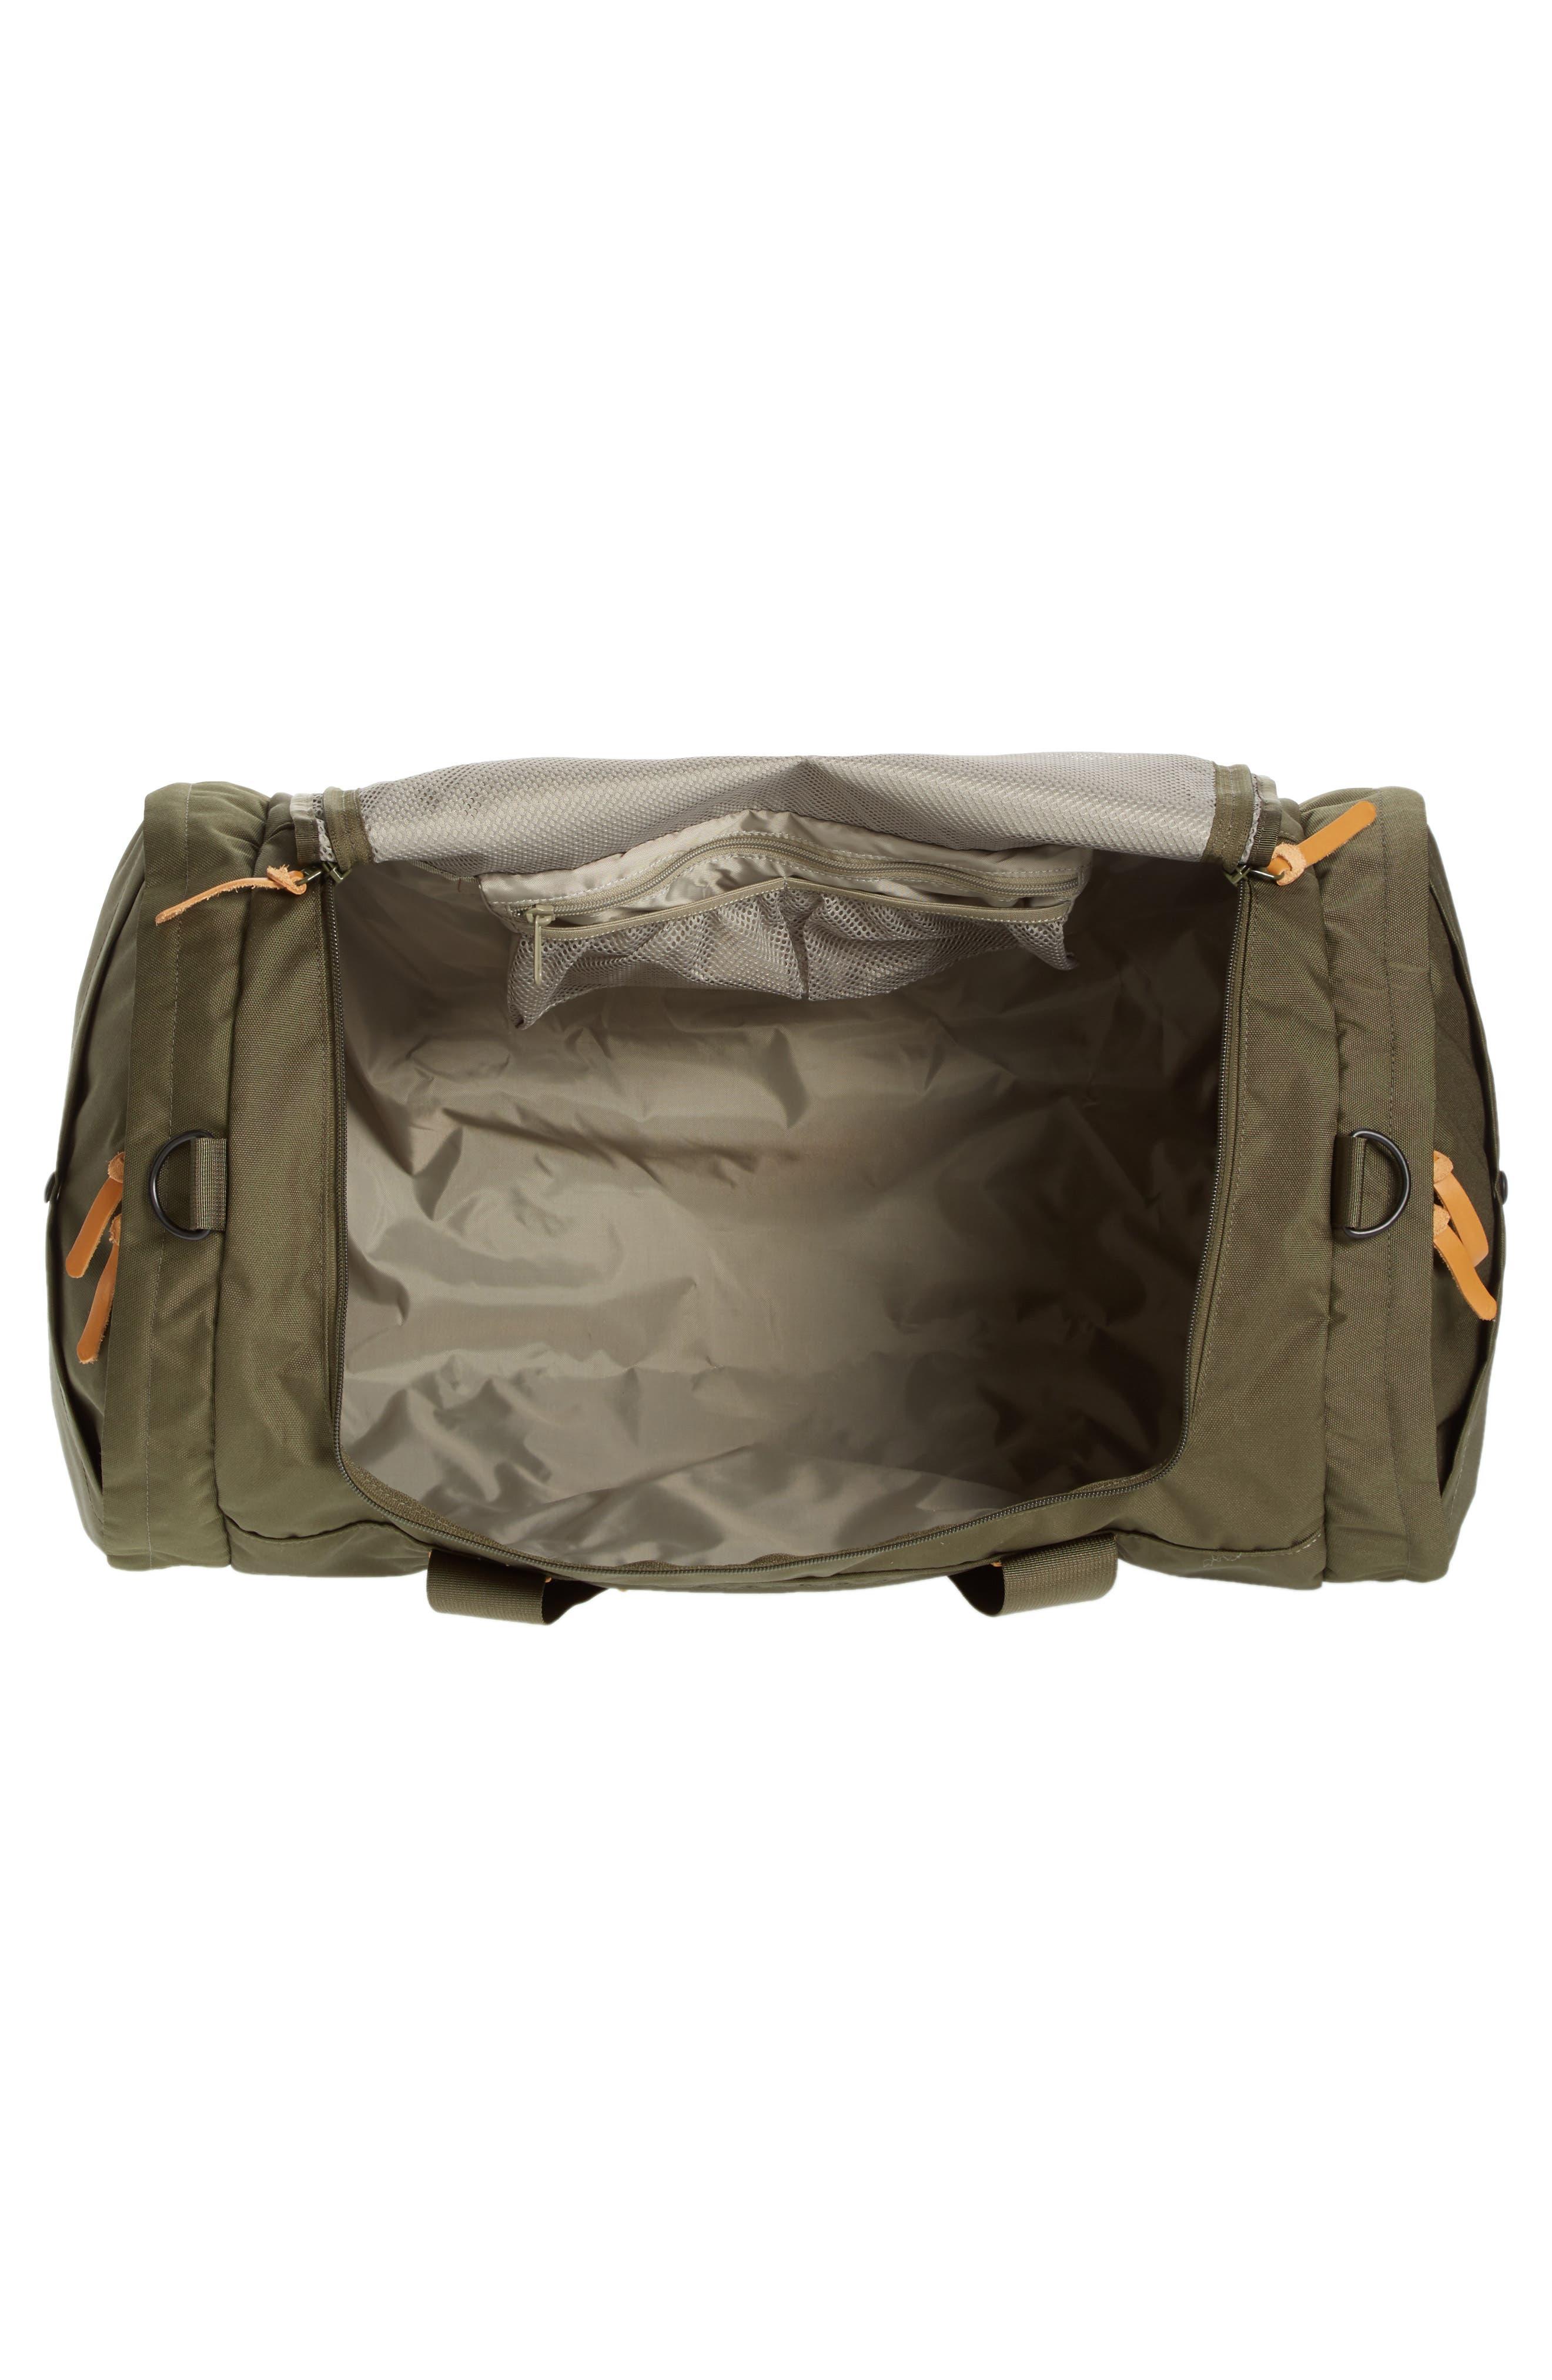 Arc Duffel Bag,                             Alternate thumbnail 4, color,                             Olive